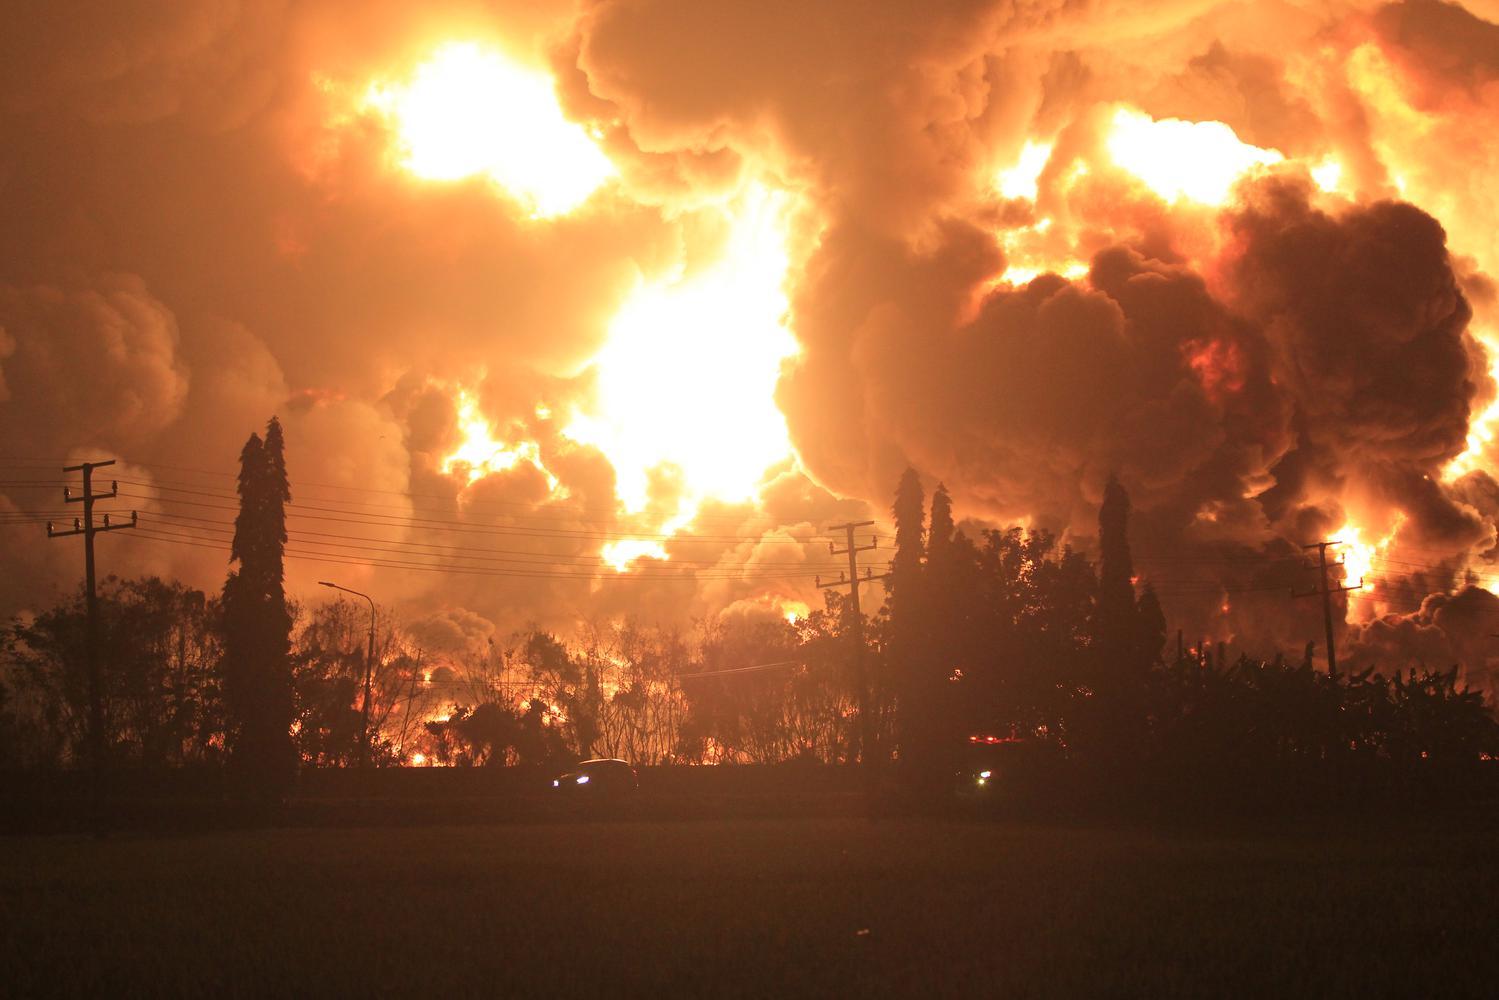 Api membumbung tinggi saat terjadi kebakaran di kompleks Pertamina RU VI Balongan, Indramayu, Jawa Barat, Senin (29/3/2021) dini hari.